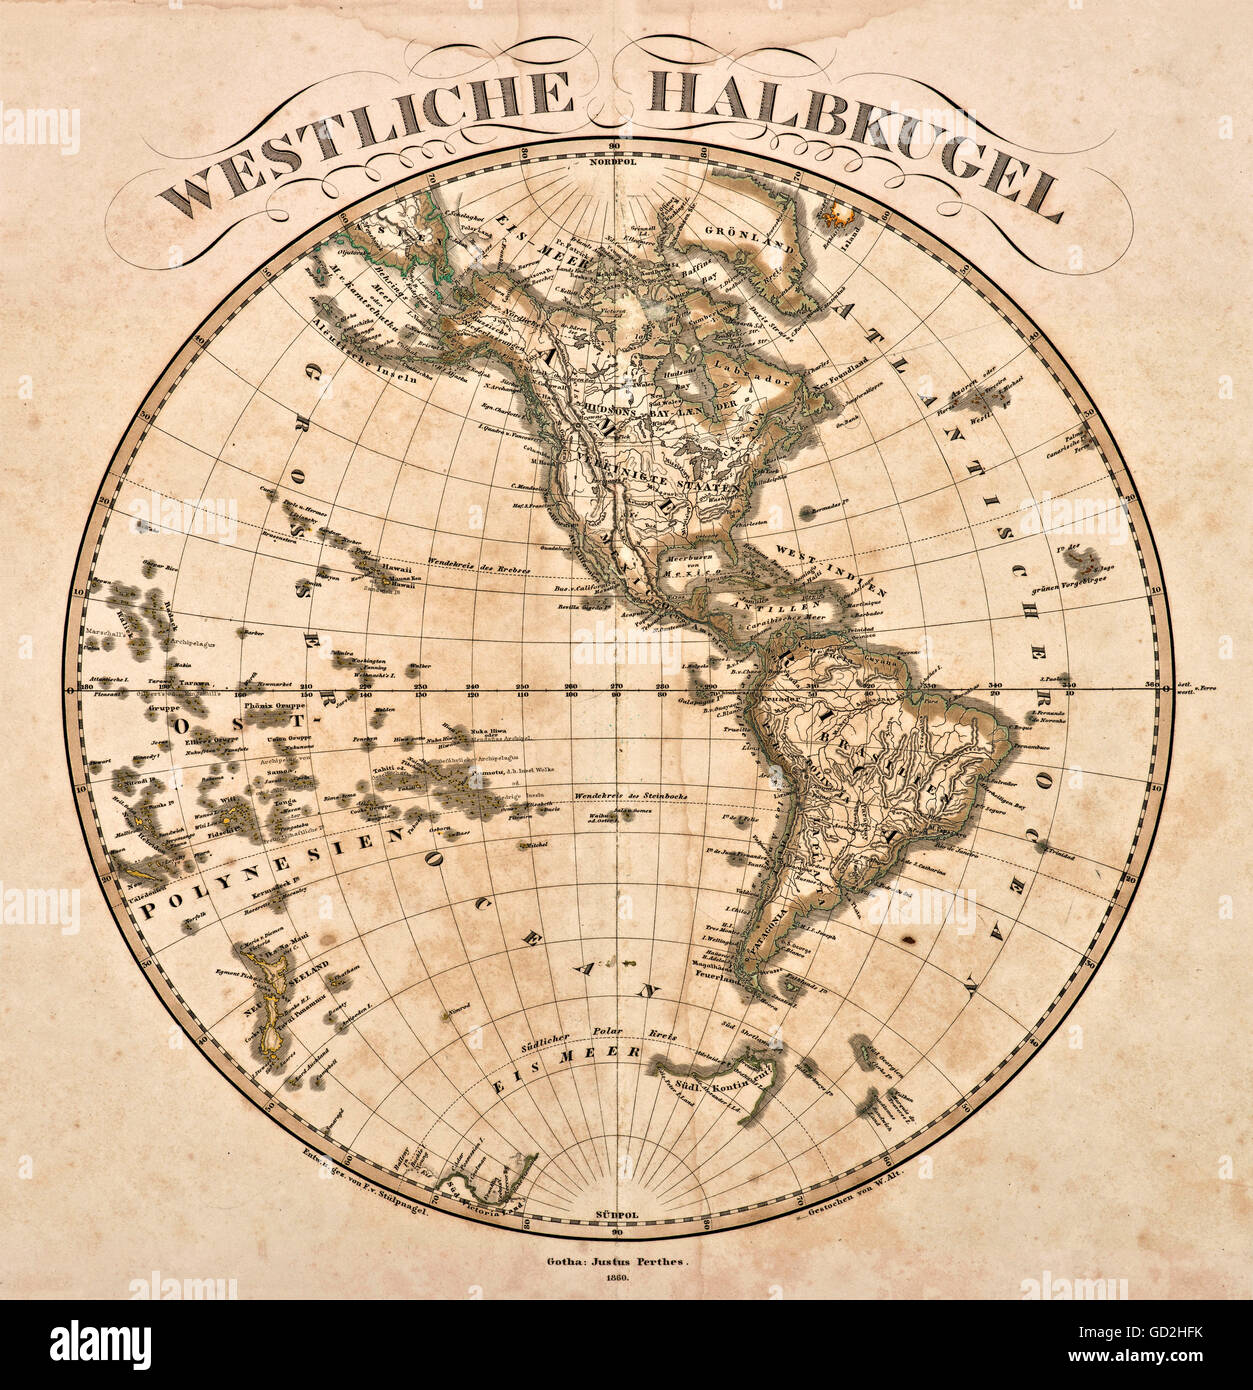 cartography, world map, Western hemisphere, out of 'Hand-Atlas ueber alle Theile der Erde und ueber das Weltgebaeude', - Stock Image